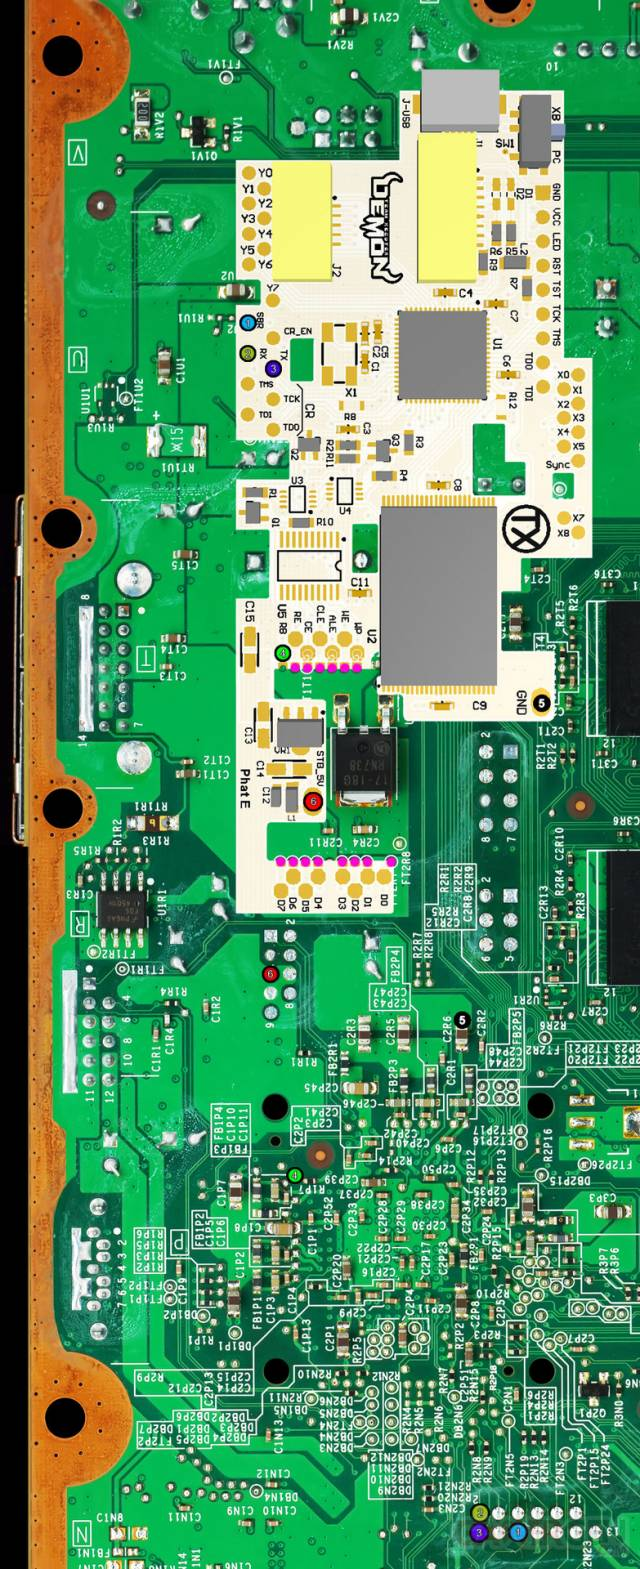 DemoN-phat-install-26